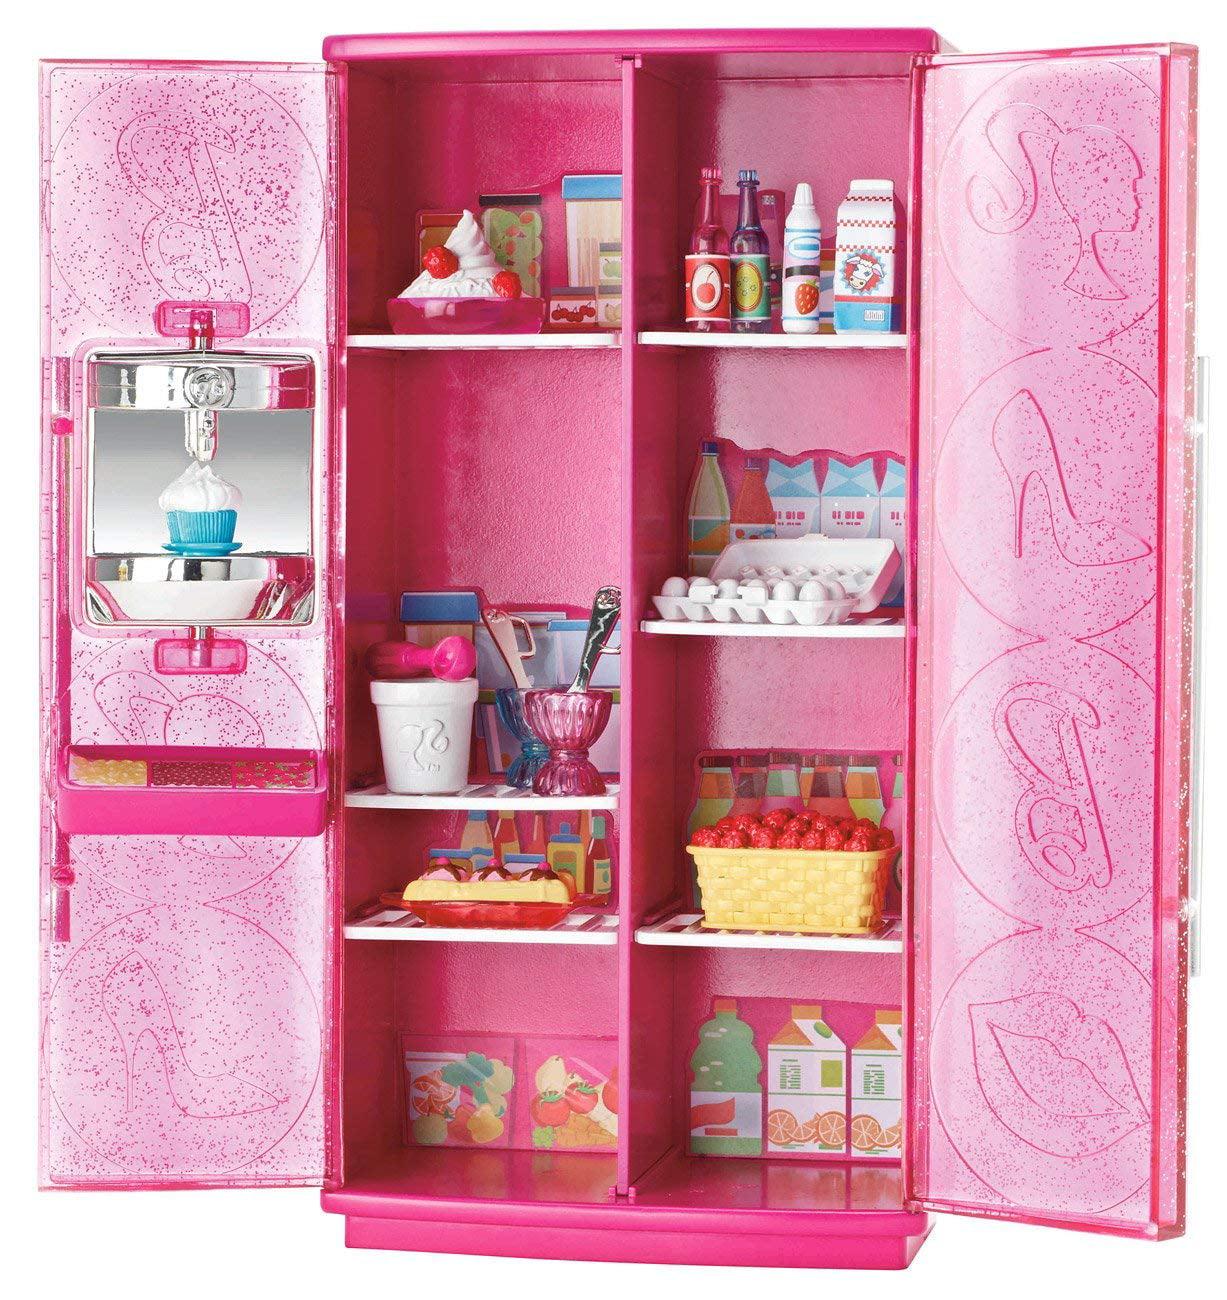 Barbie Basic Furniture Treats to TV Fridge Play Set